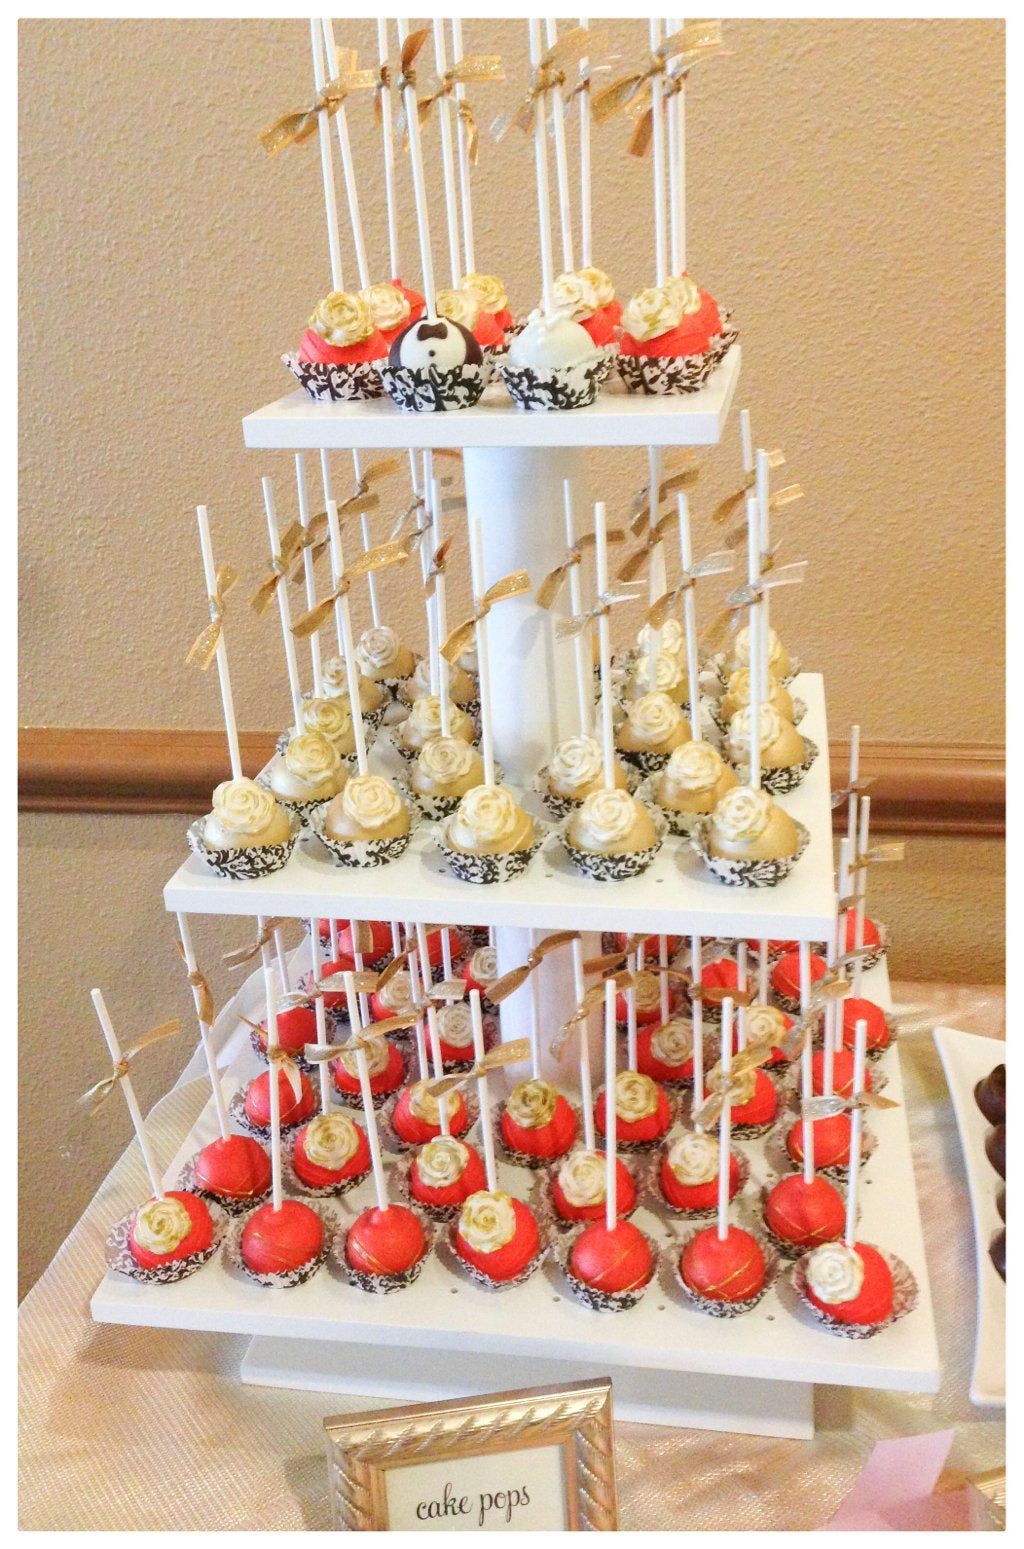 cake push pops stand